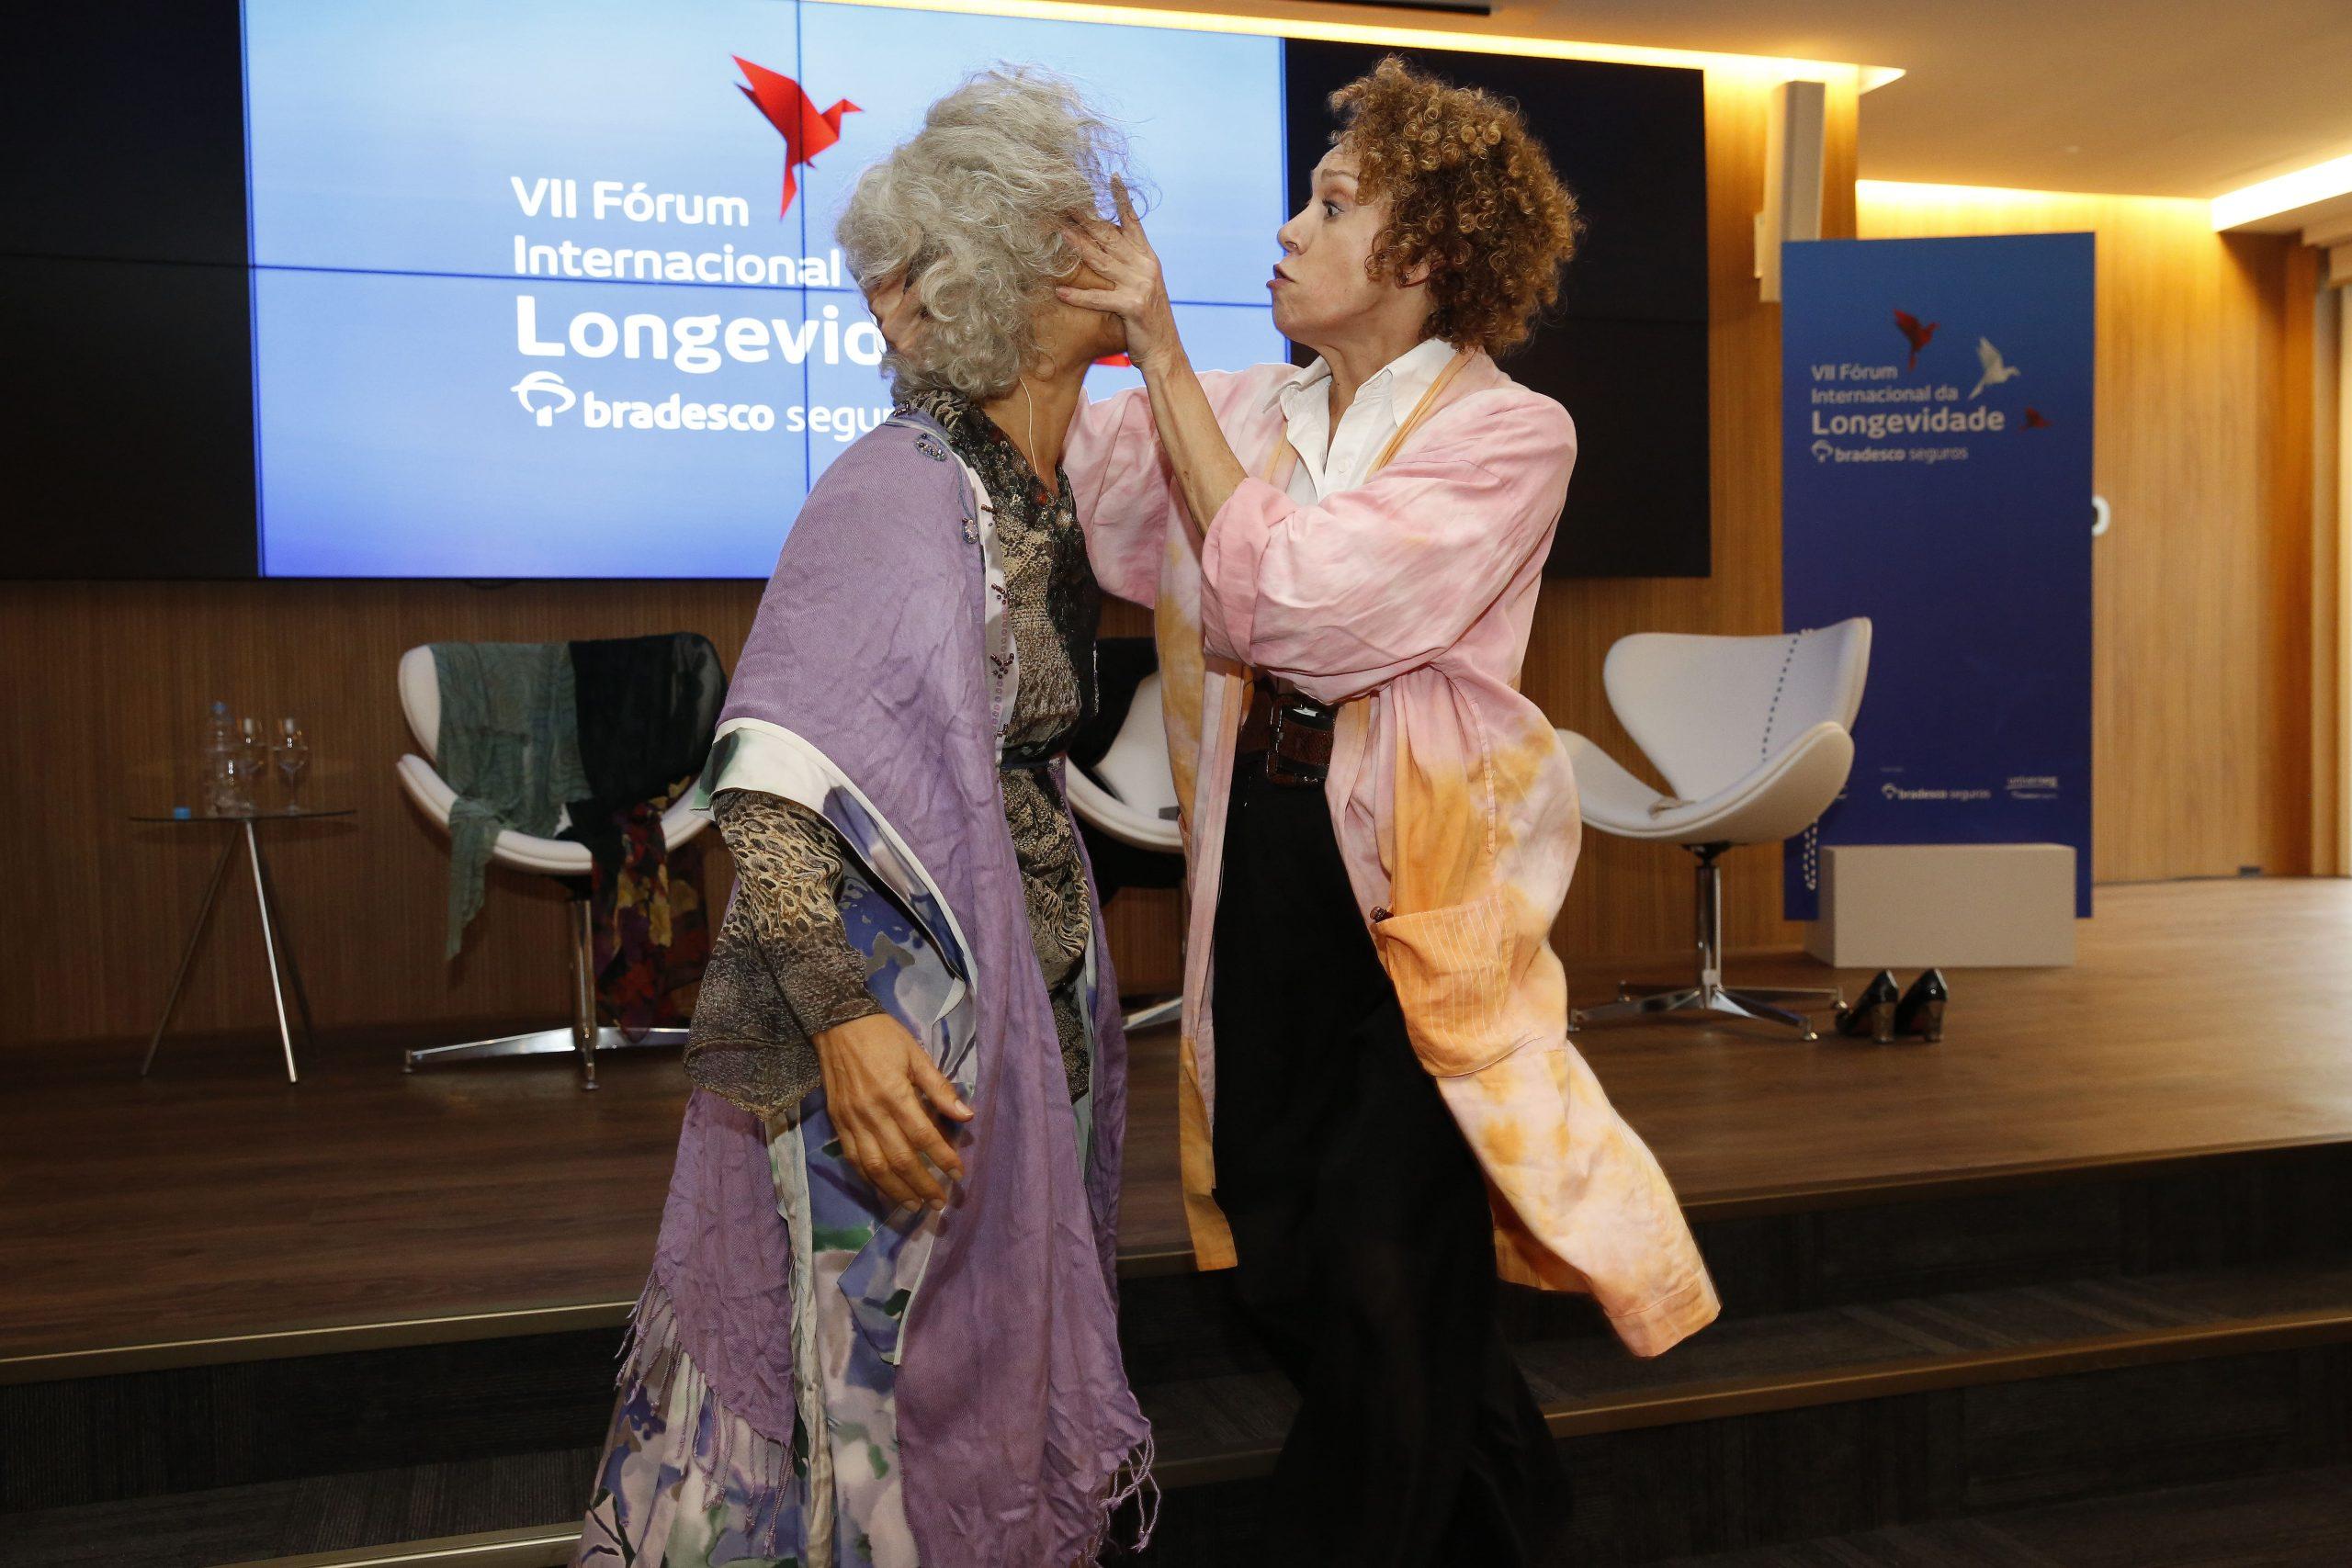 2 Amir Haddad, Peça Rugas - VII Fórum Internacional da Longevidade